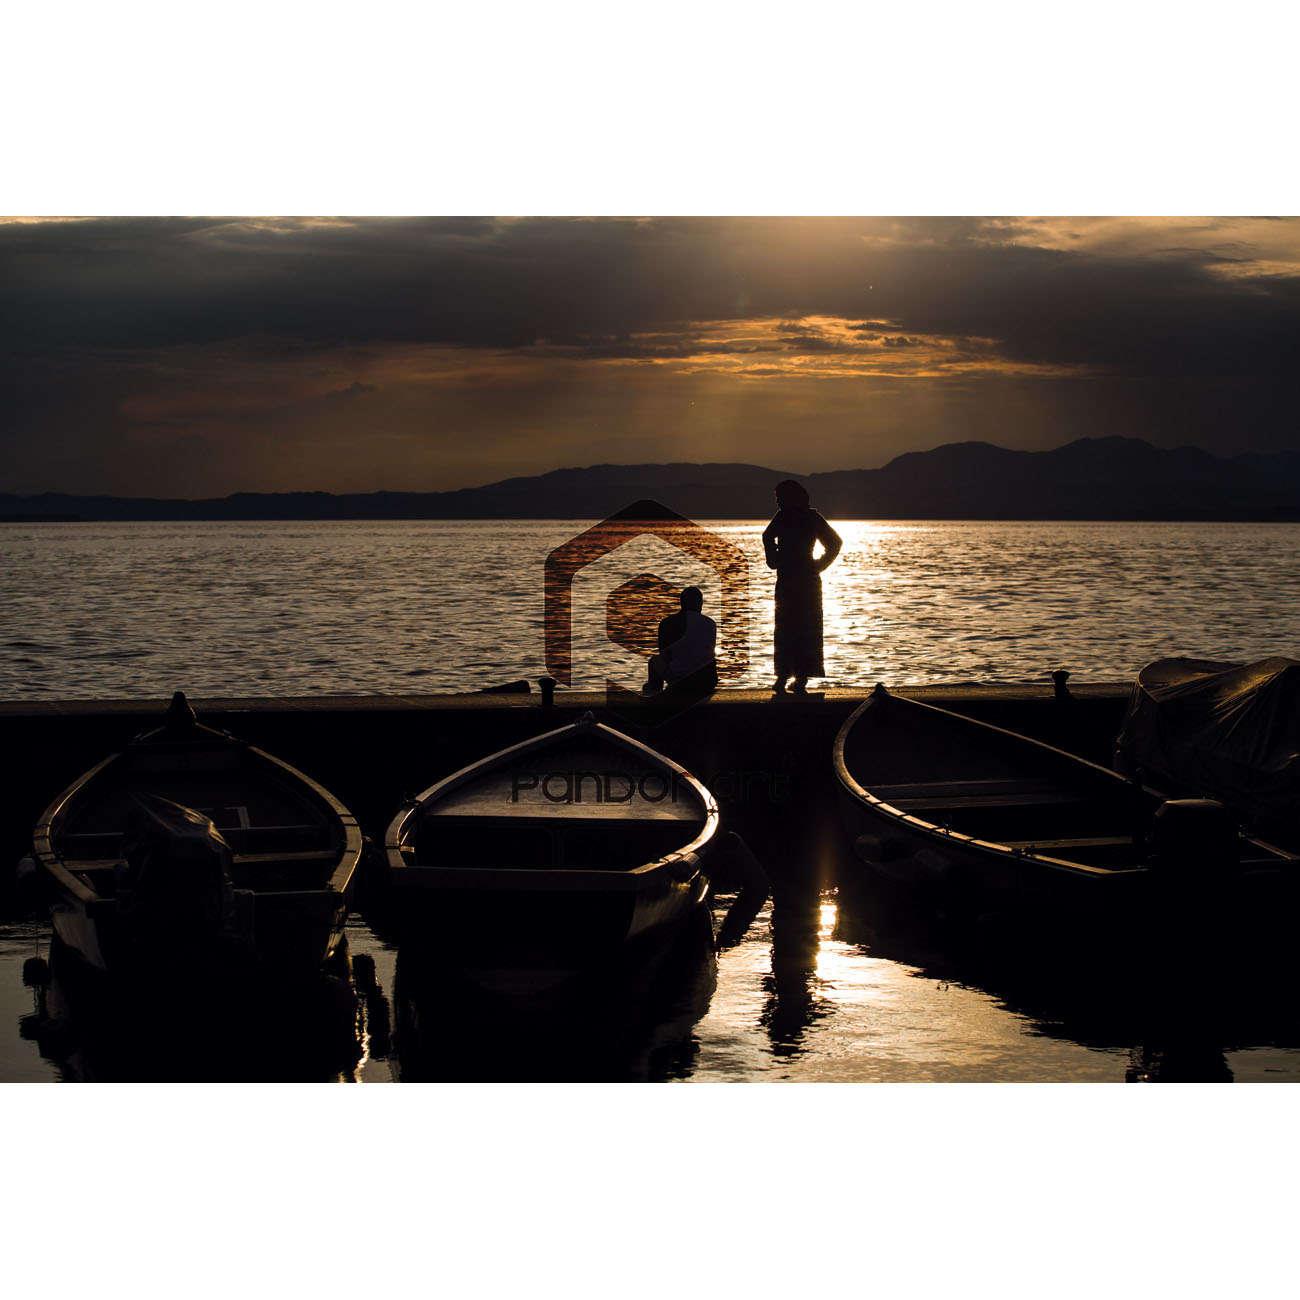 Golden-lake Thomas Manillier photographie d'art